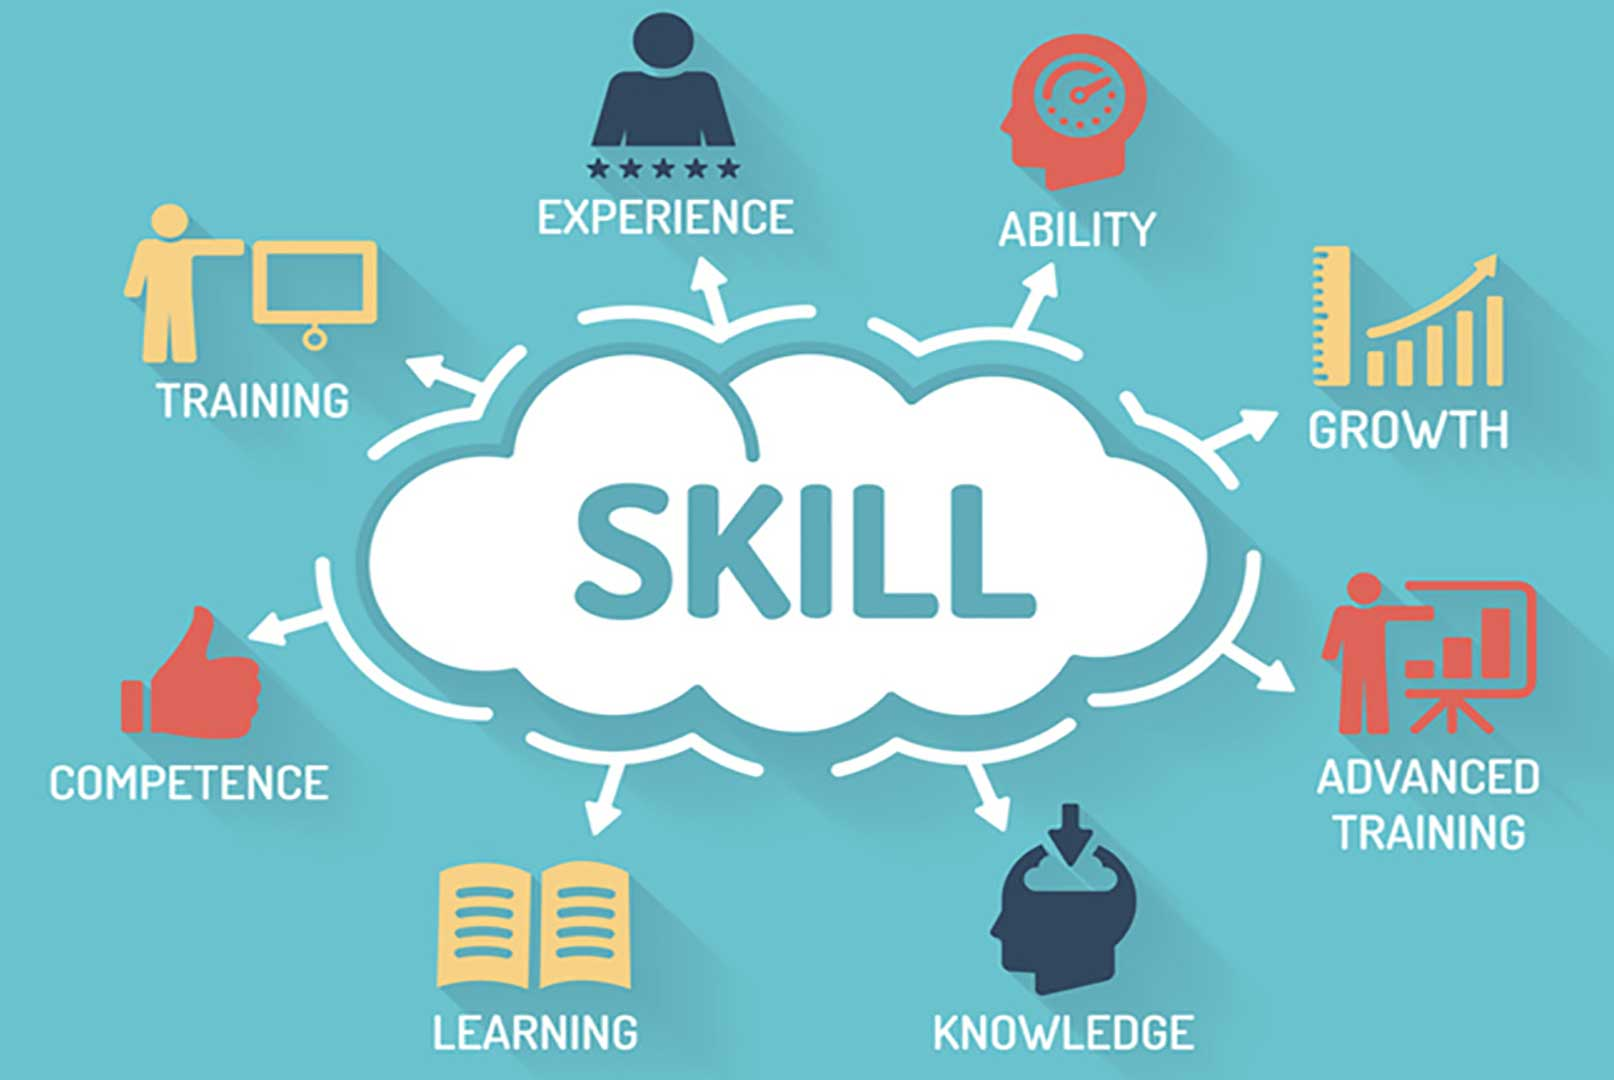 ICanCaRe-Skill Development